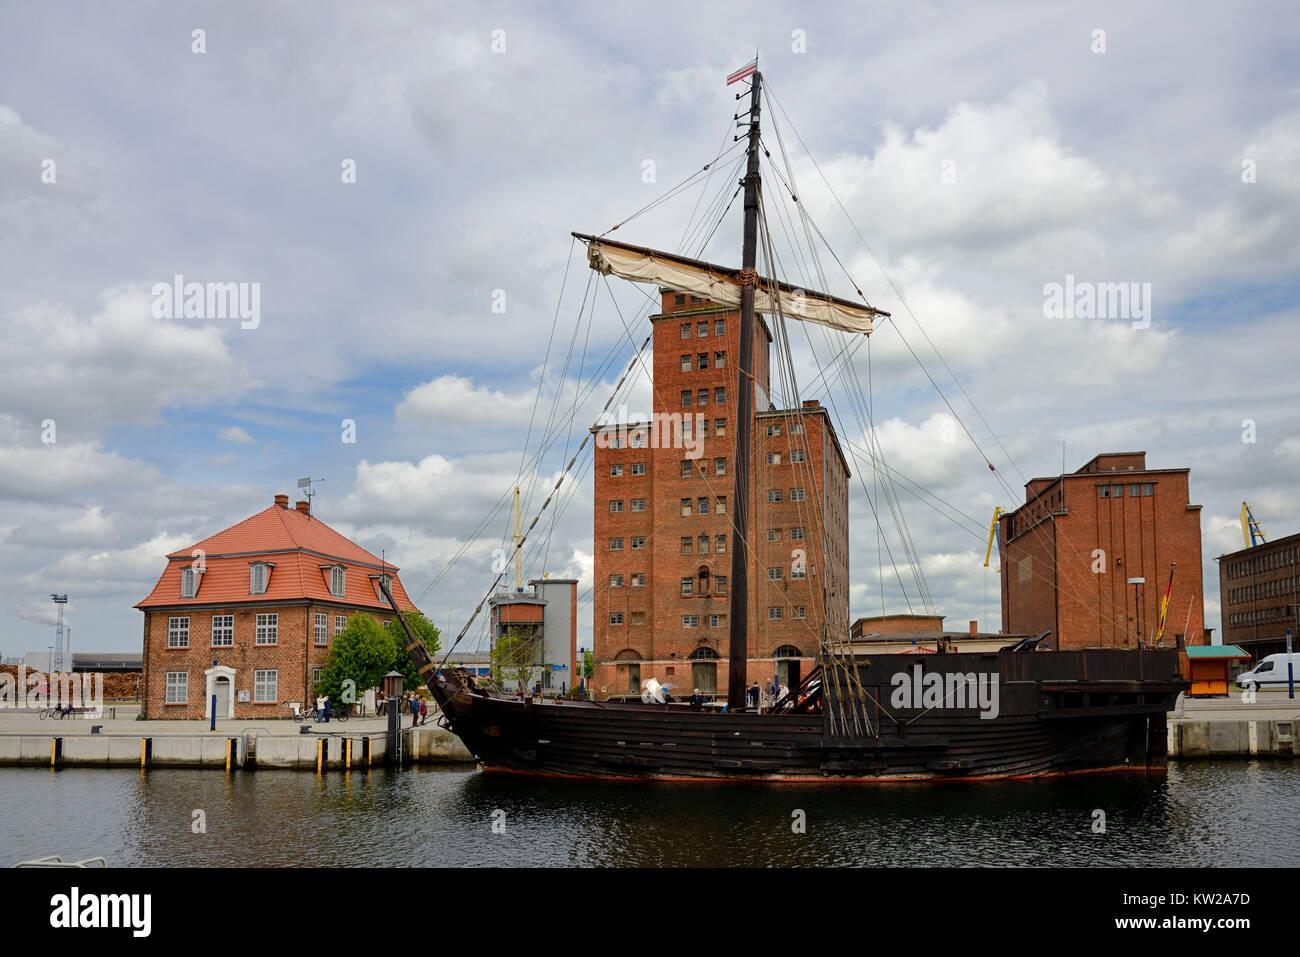 Wismar, old harbour, Kogge Wissemara, Alter Hafen - Stock Image